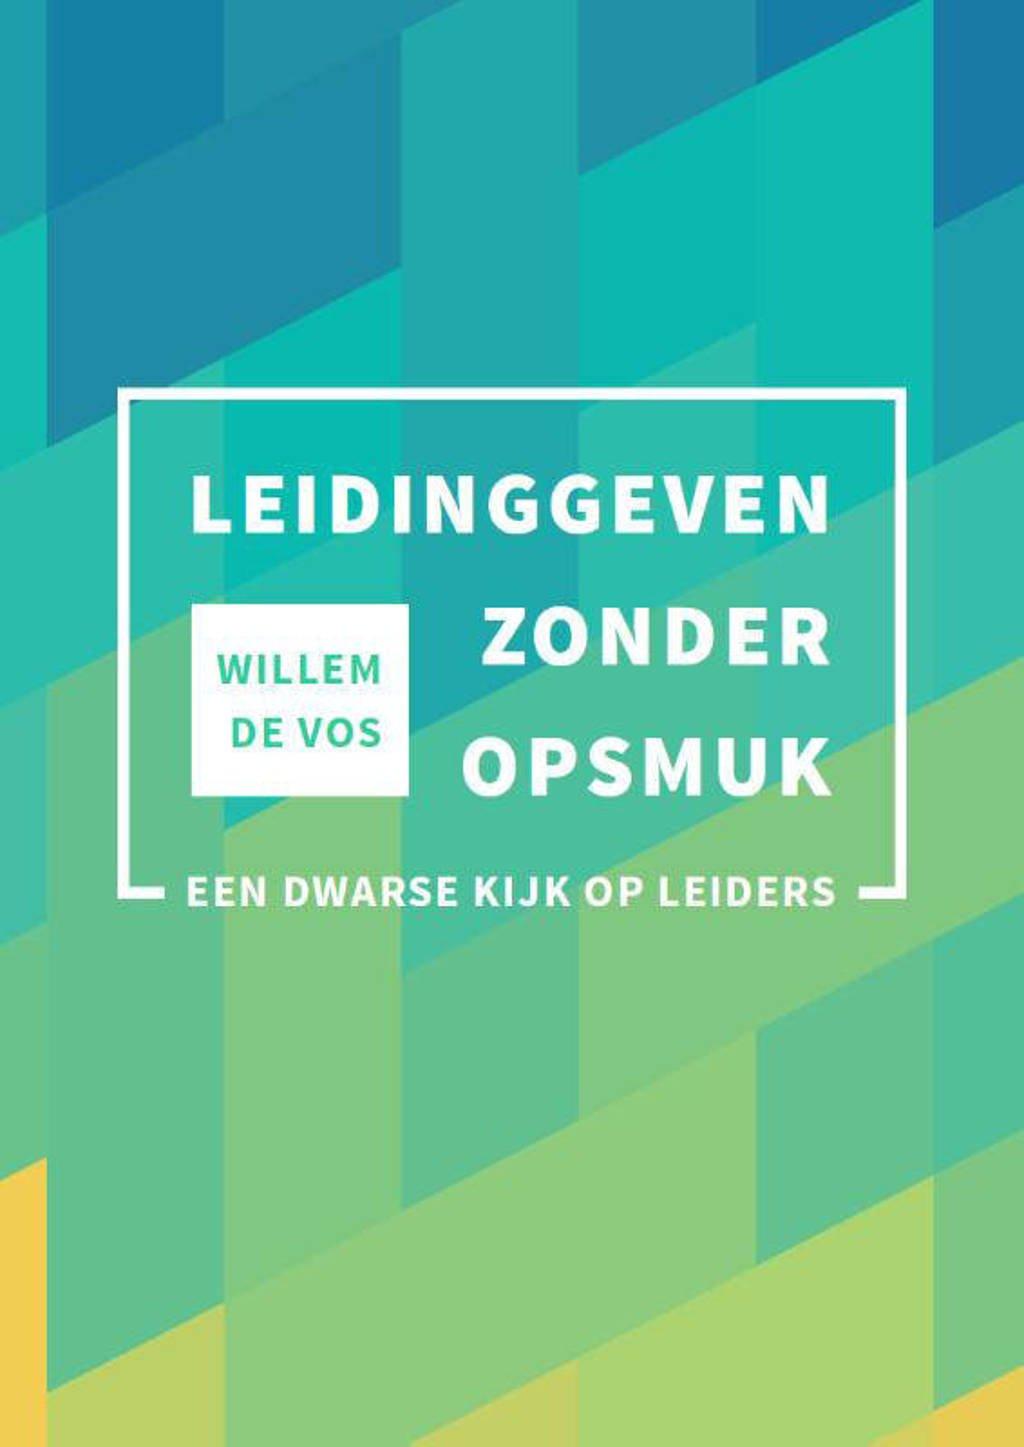 Leidinggeven zonder opsmuk - Willem de Vos